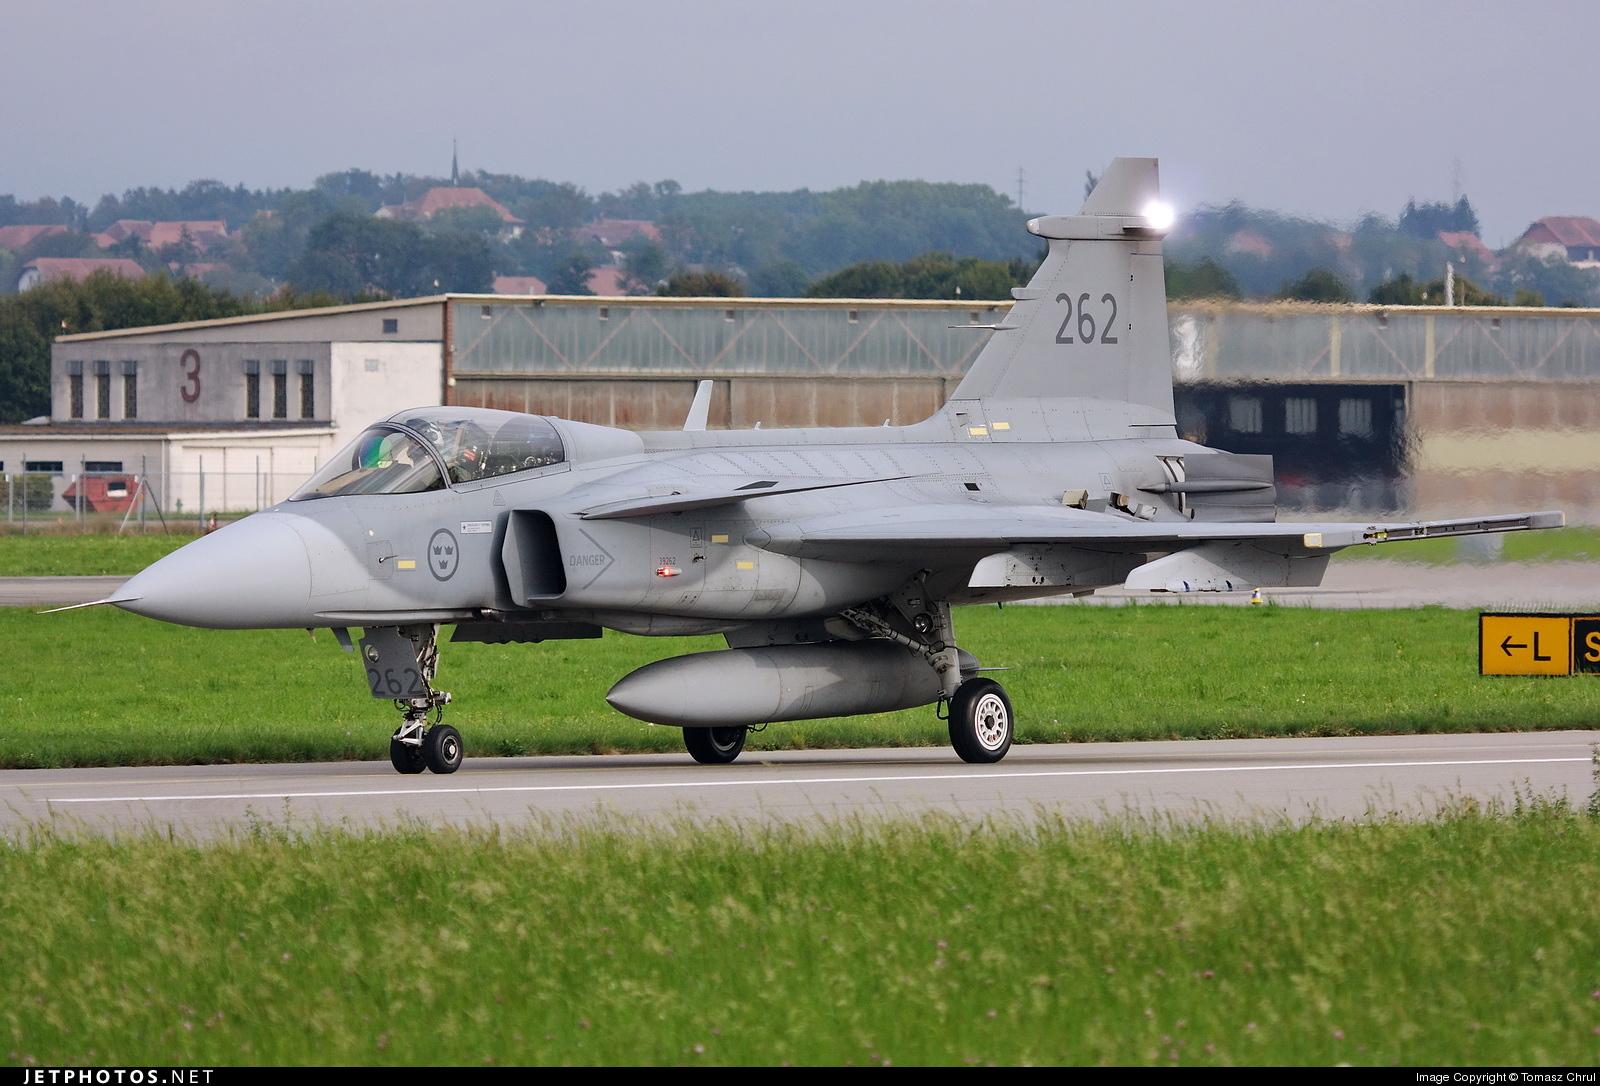 39262 - Saab JAS-39C Gripen - Sweden - Air Force